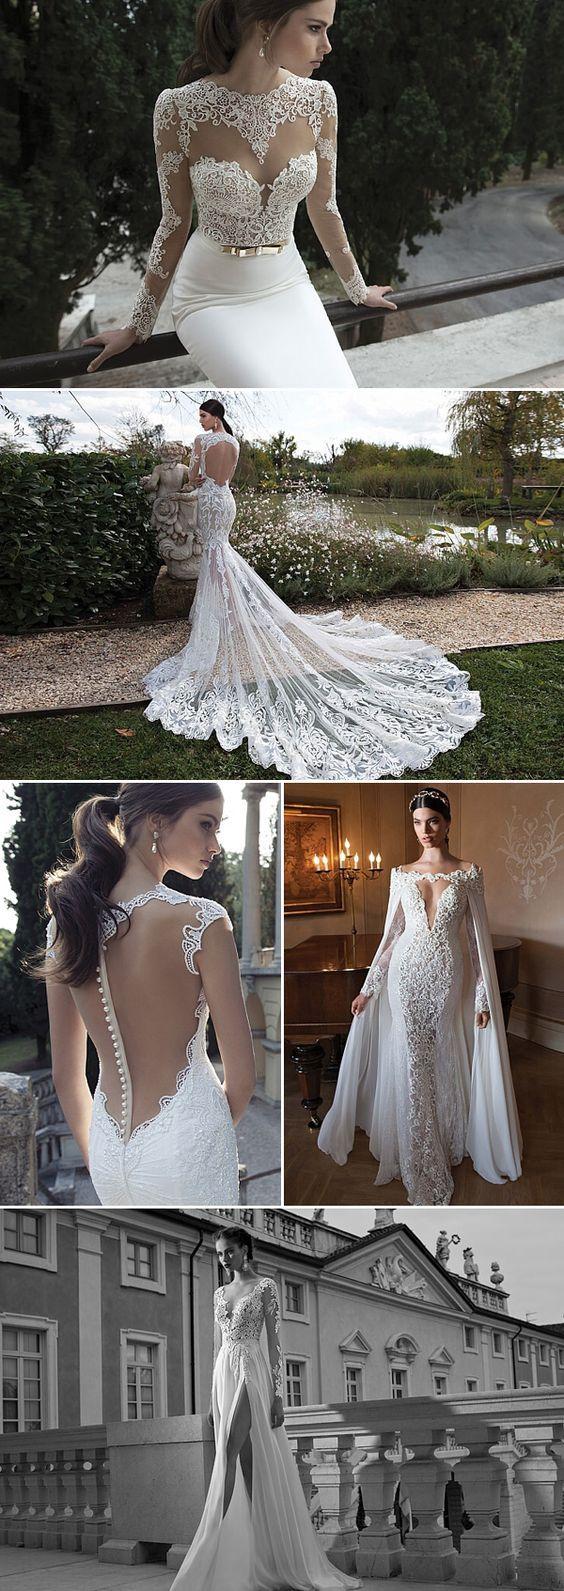 Sexiest Collection Ever! Top 10 Israeli Wedding Dress Designers We Love!